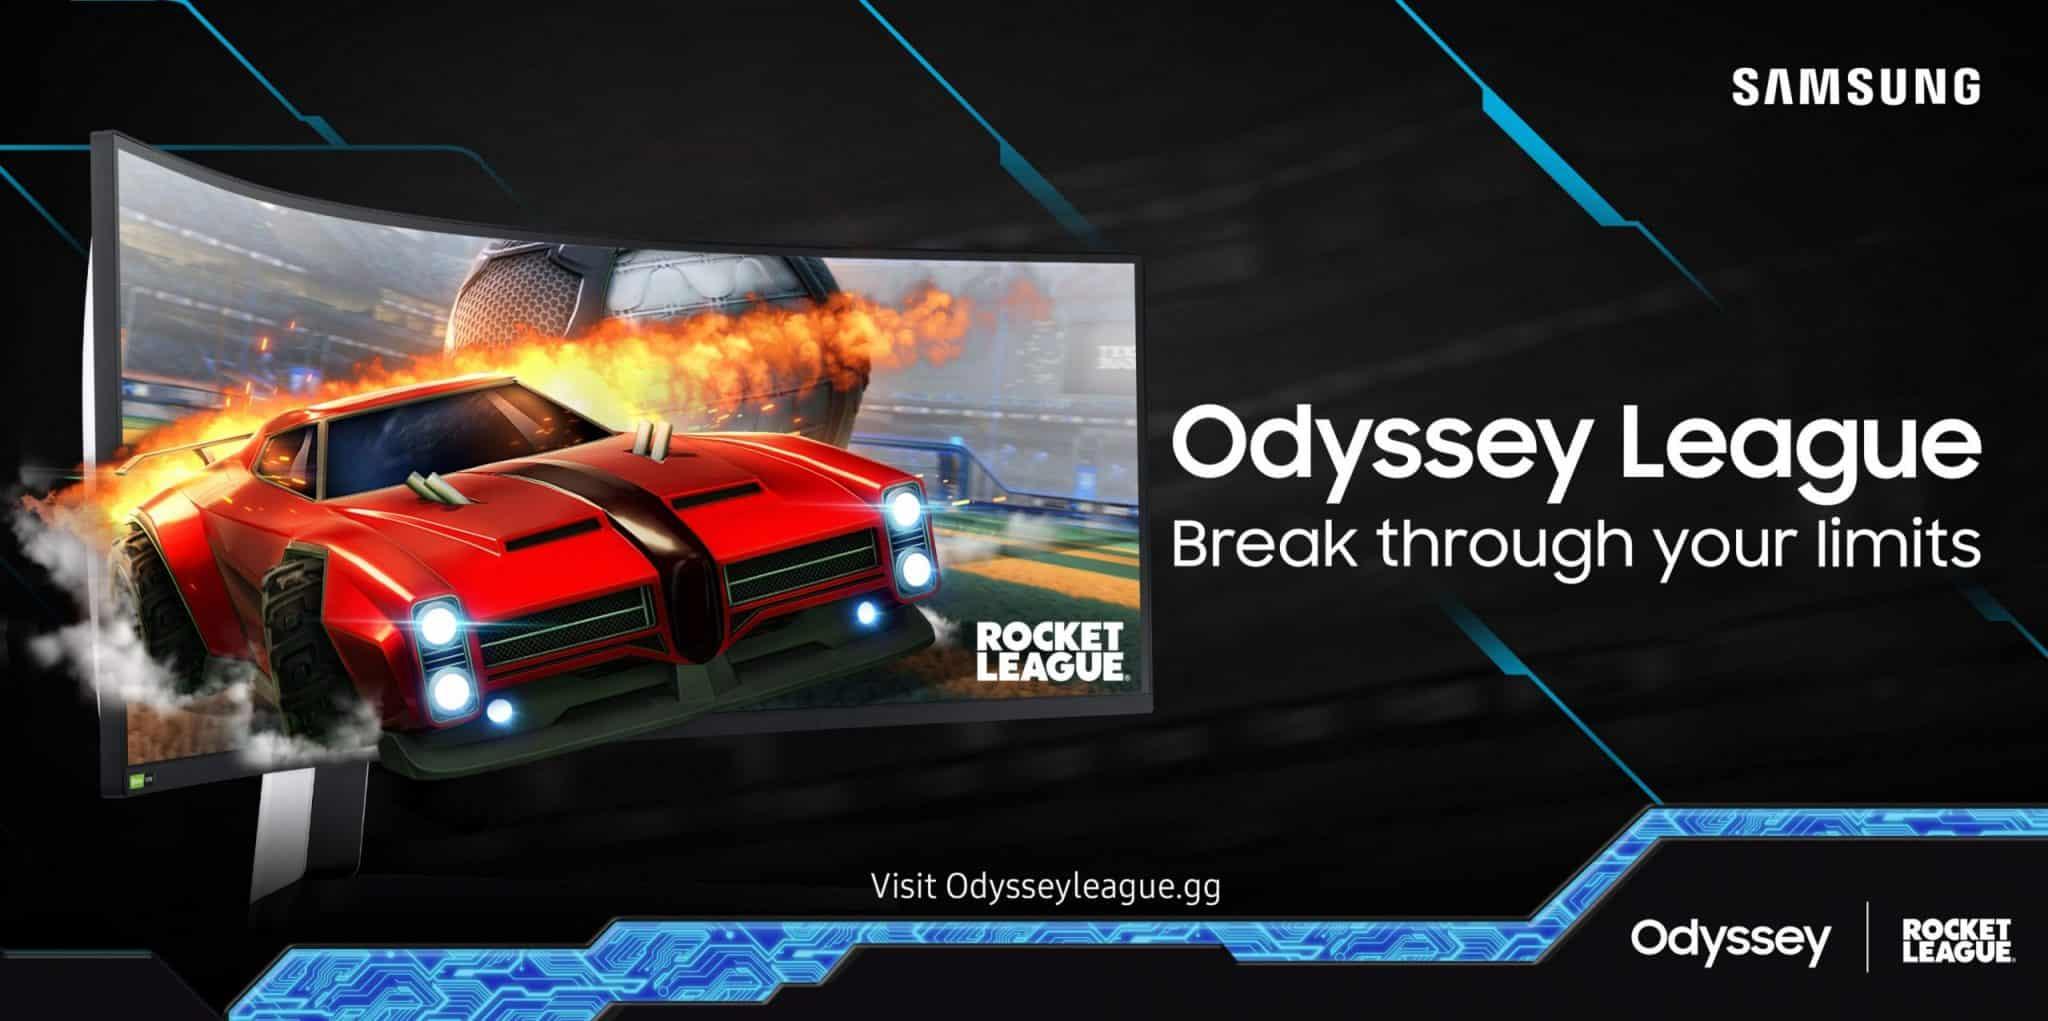 Samsung Odyssey League